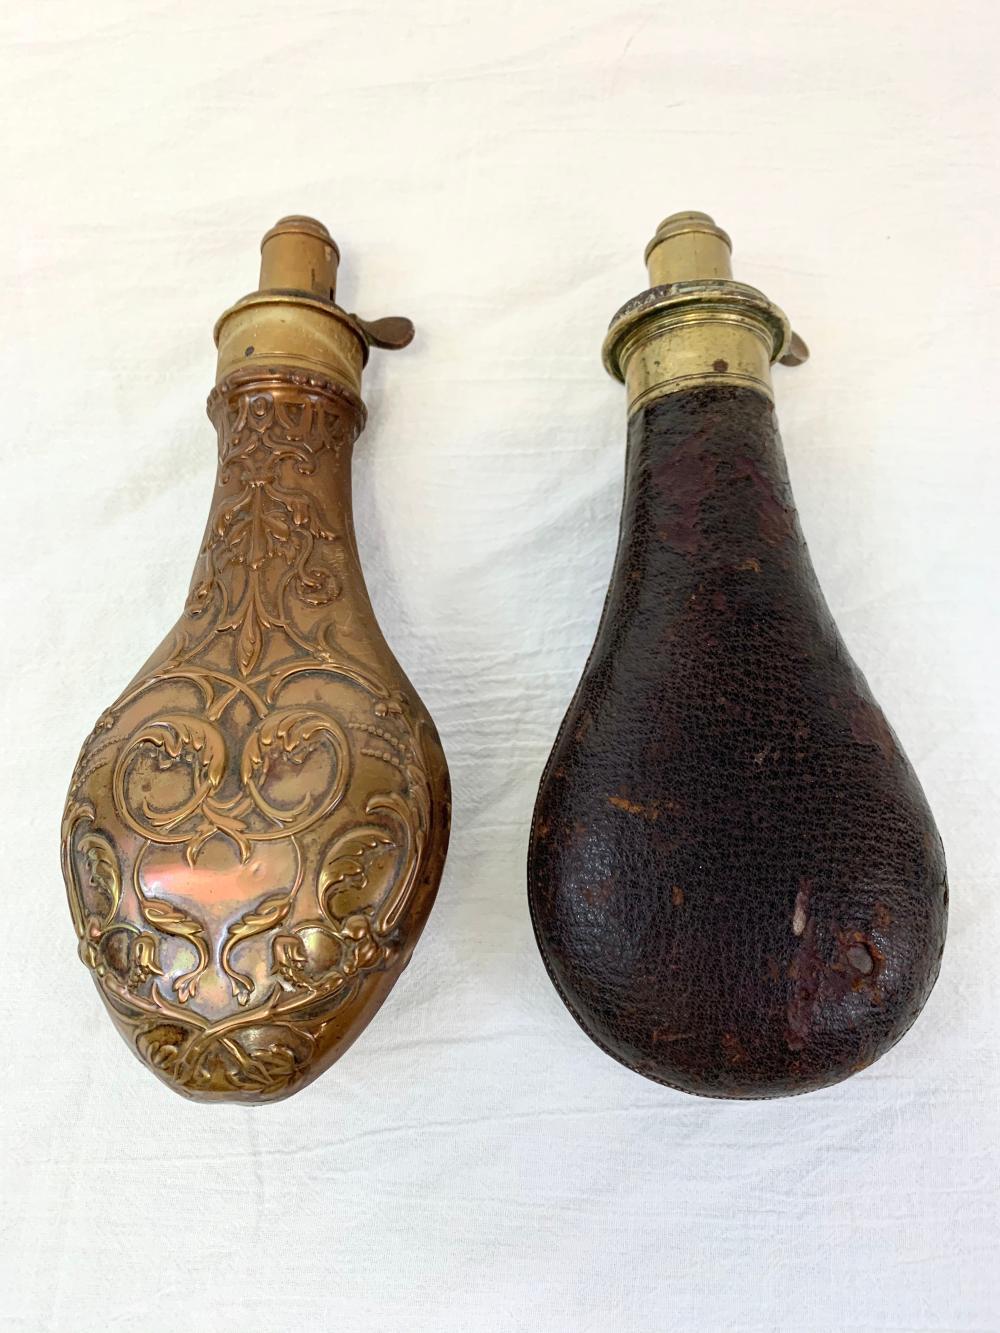 Two Antique Powder Flasks